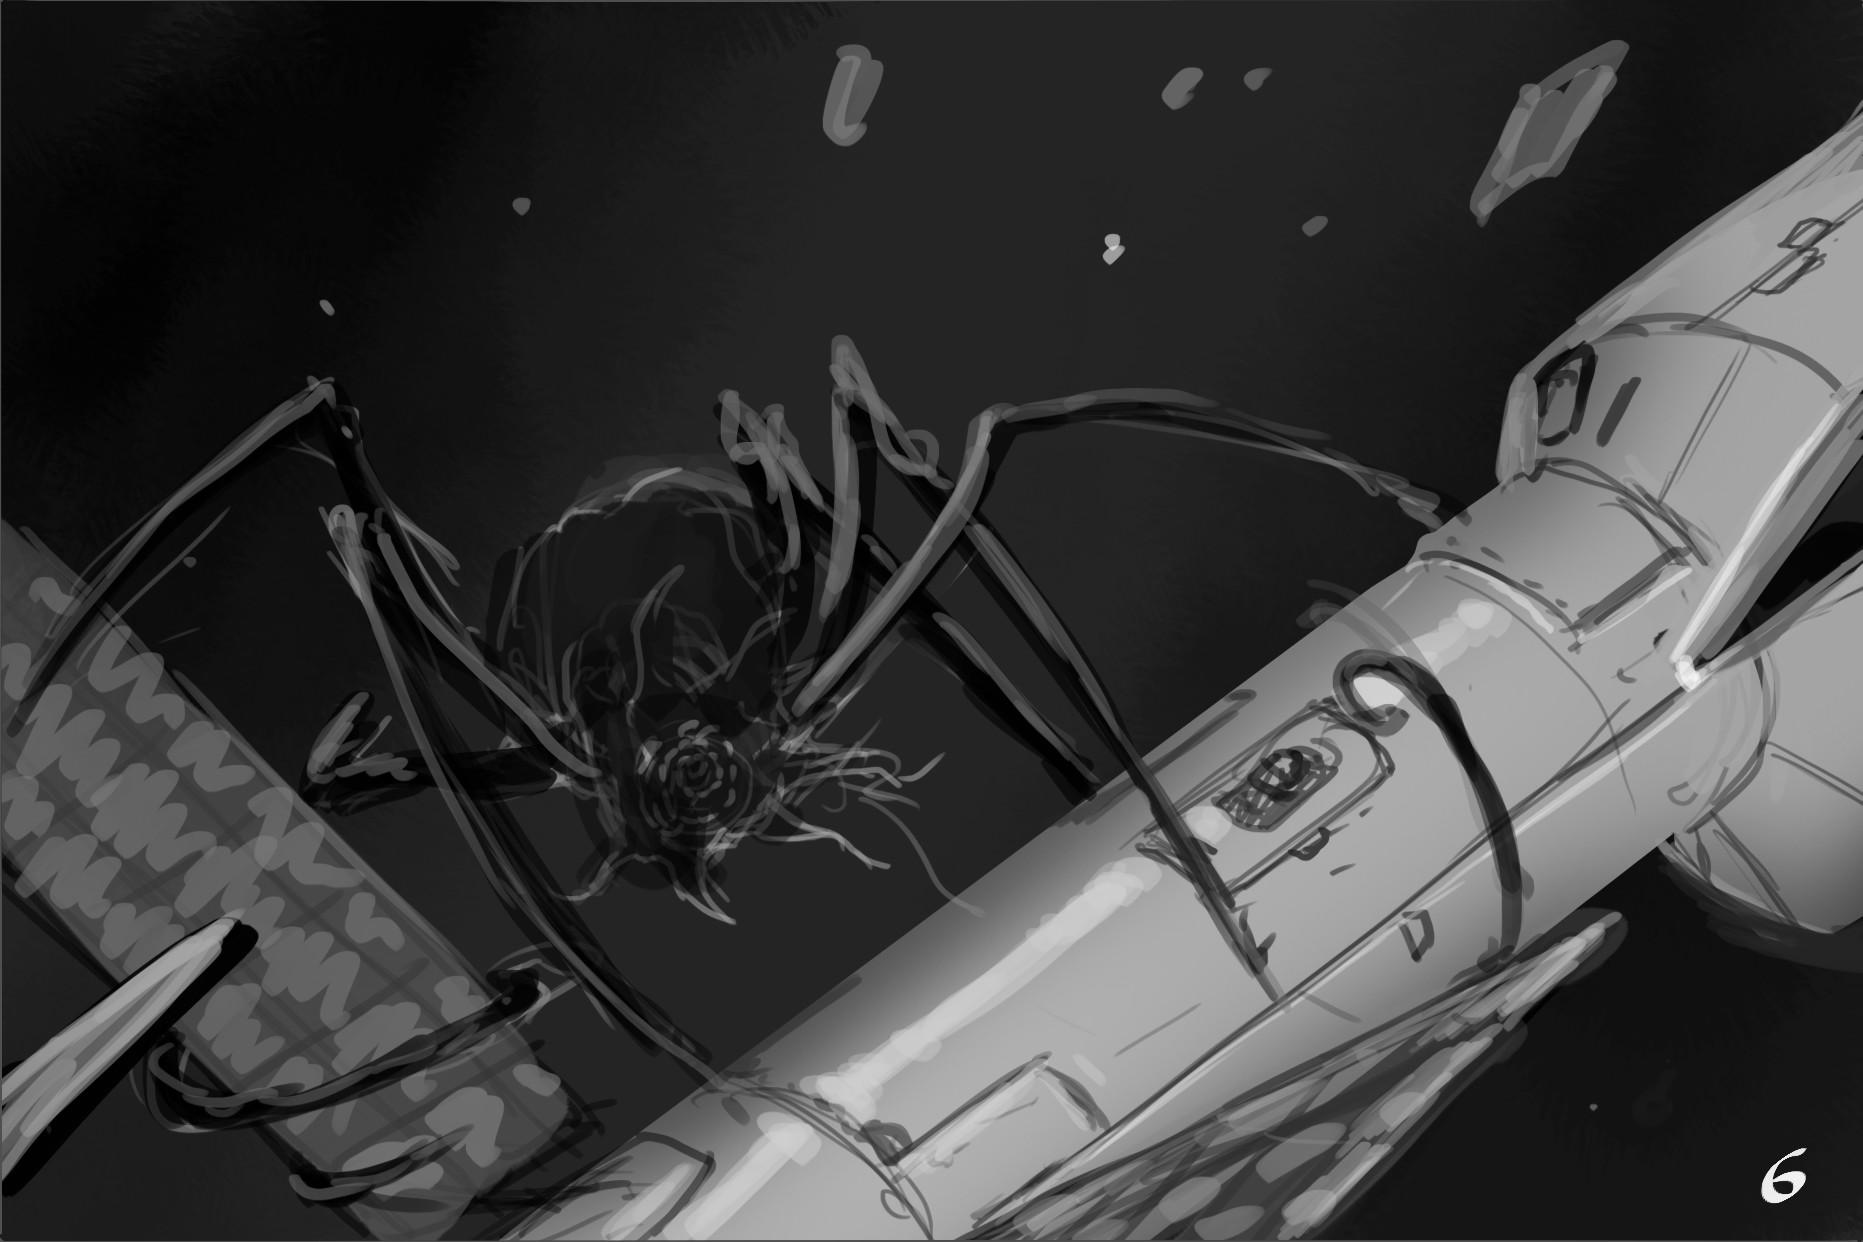 Kaithzer morejon matanga terror espacial 0005 capa 0 copia 2